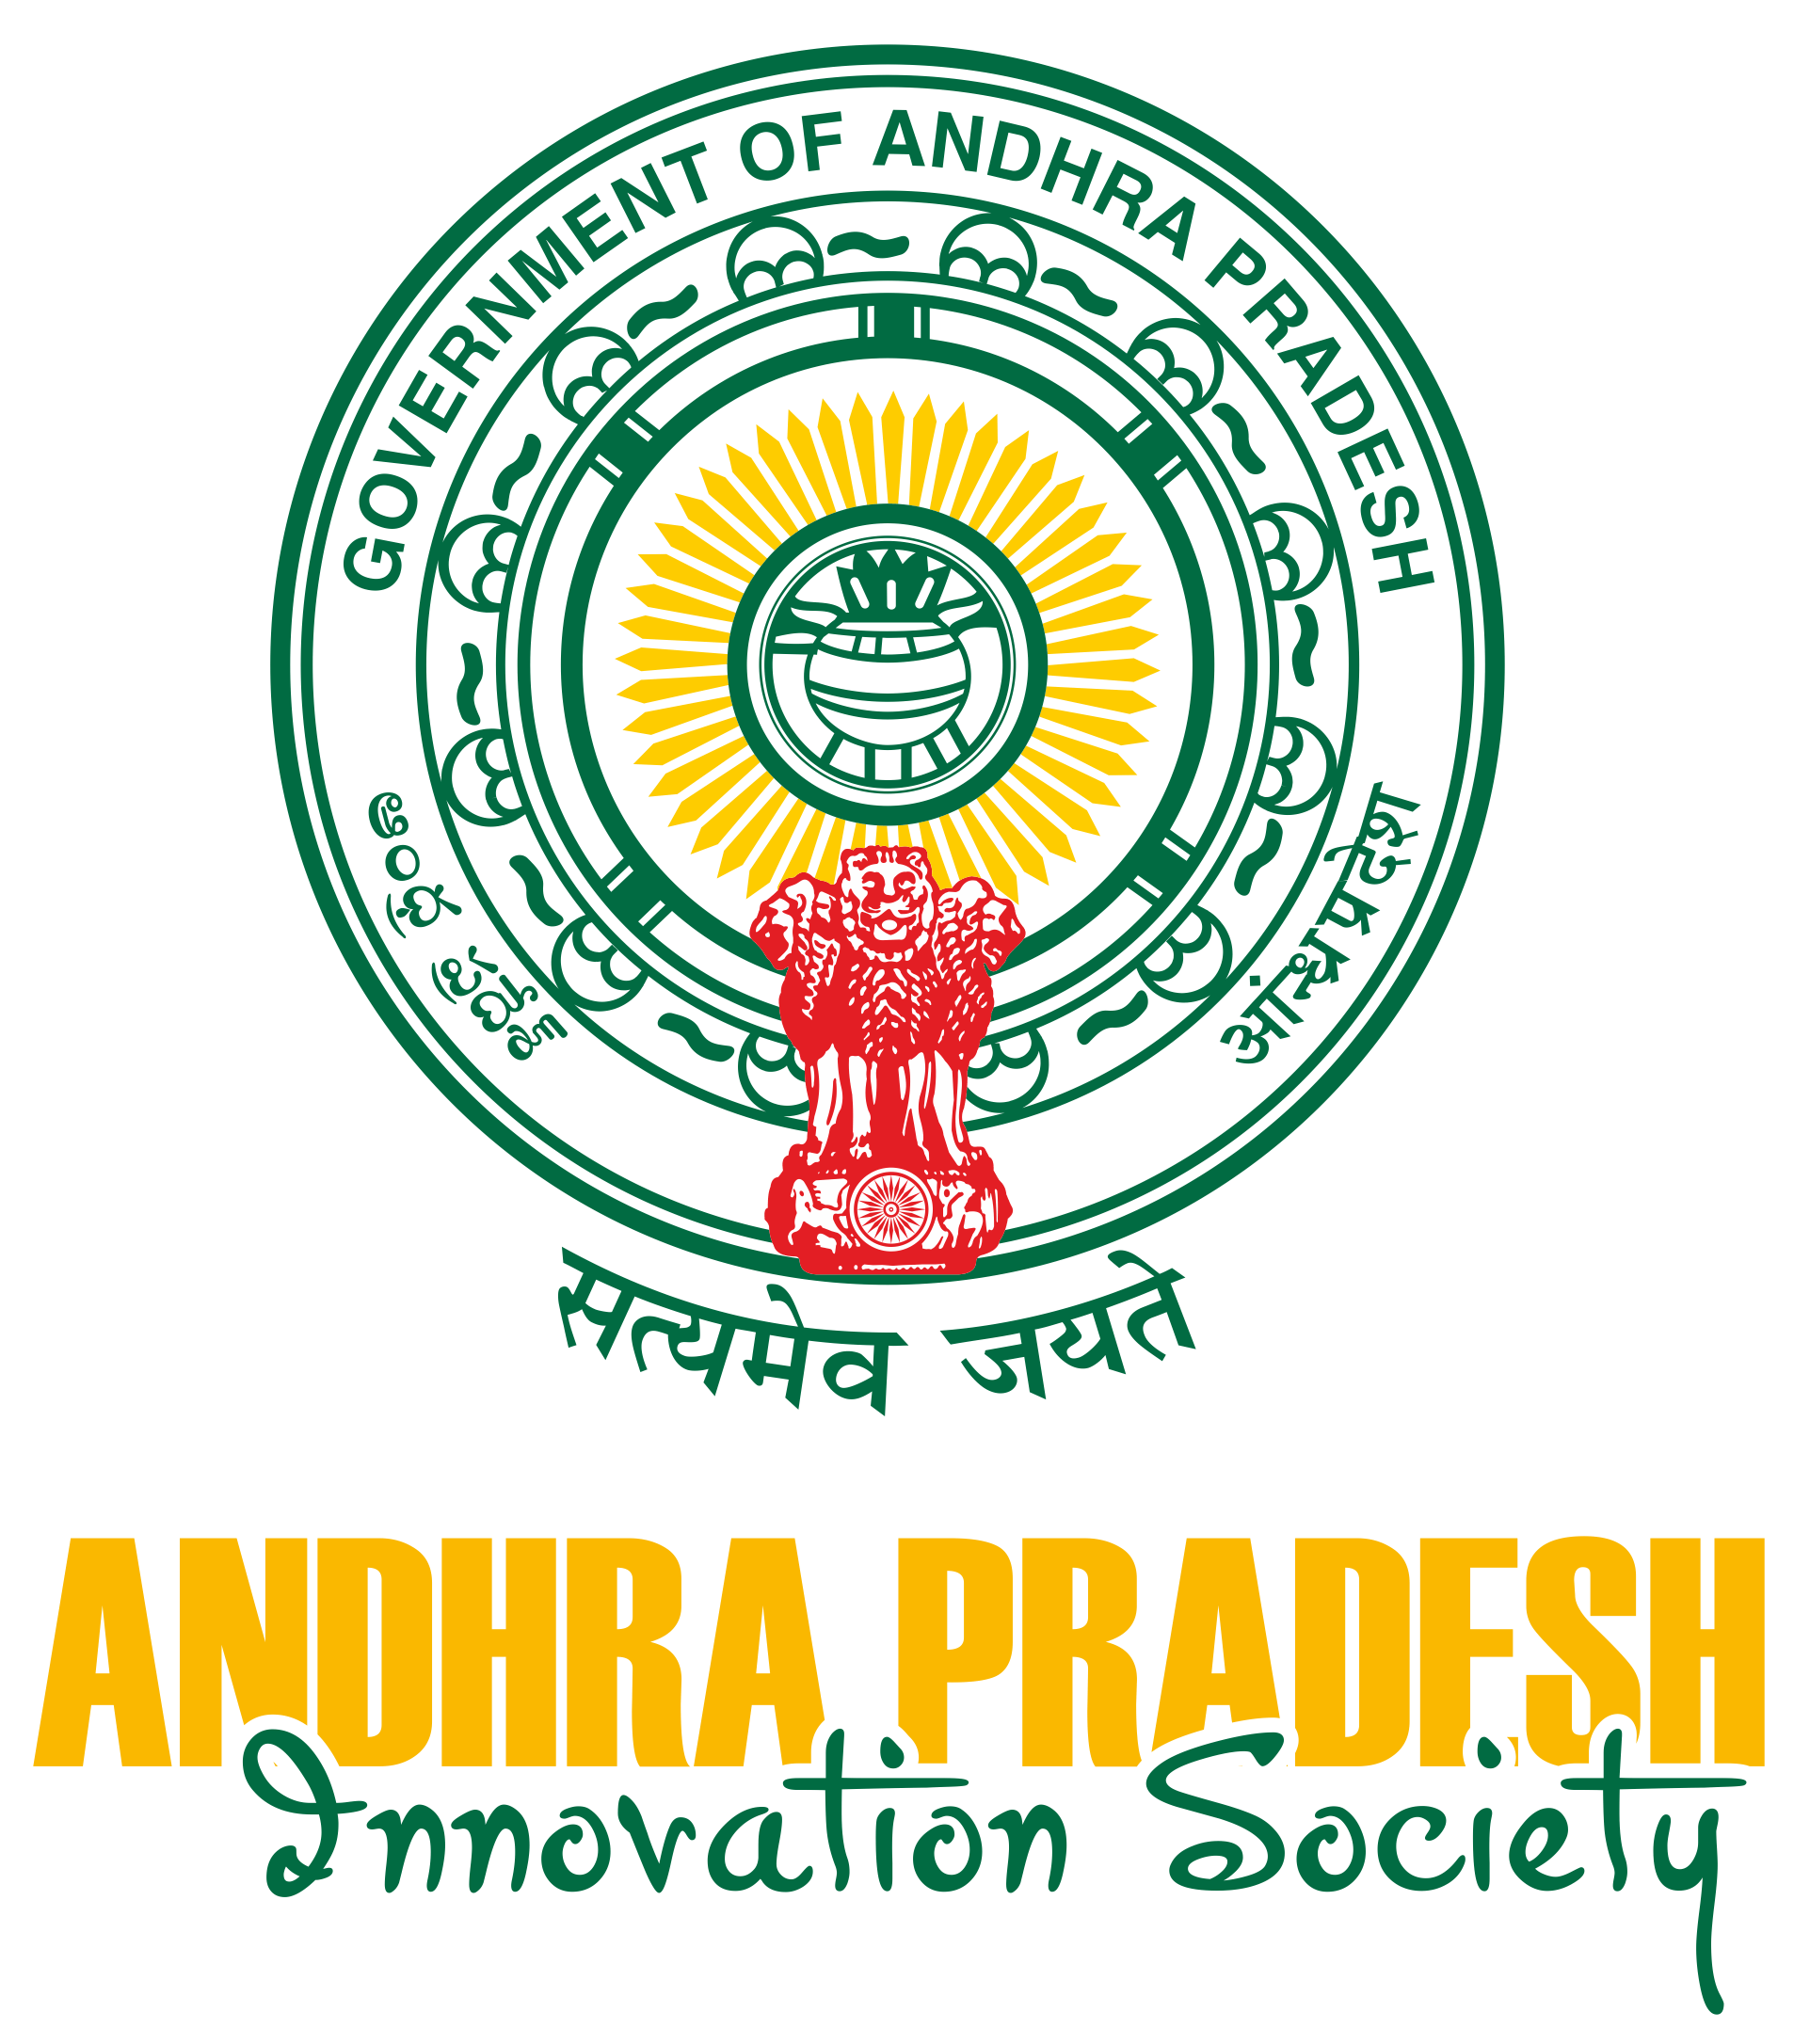 AndhraPradesh Innovation